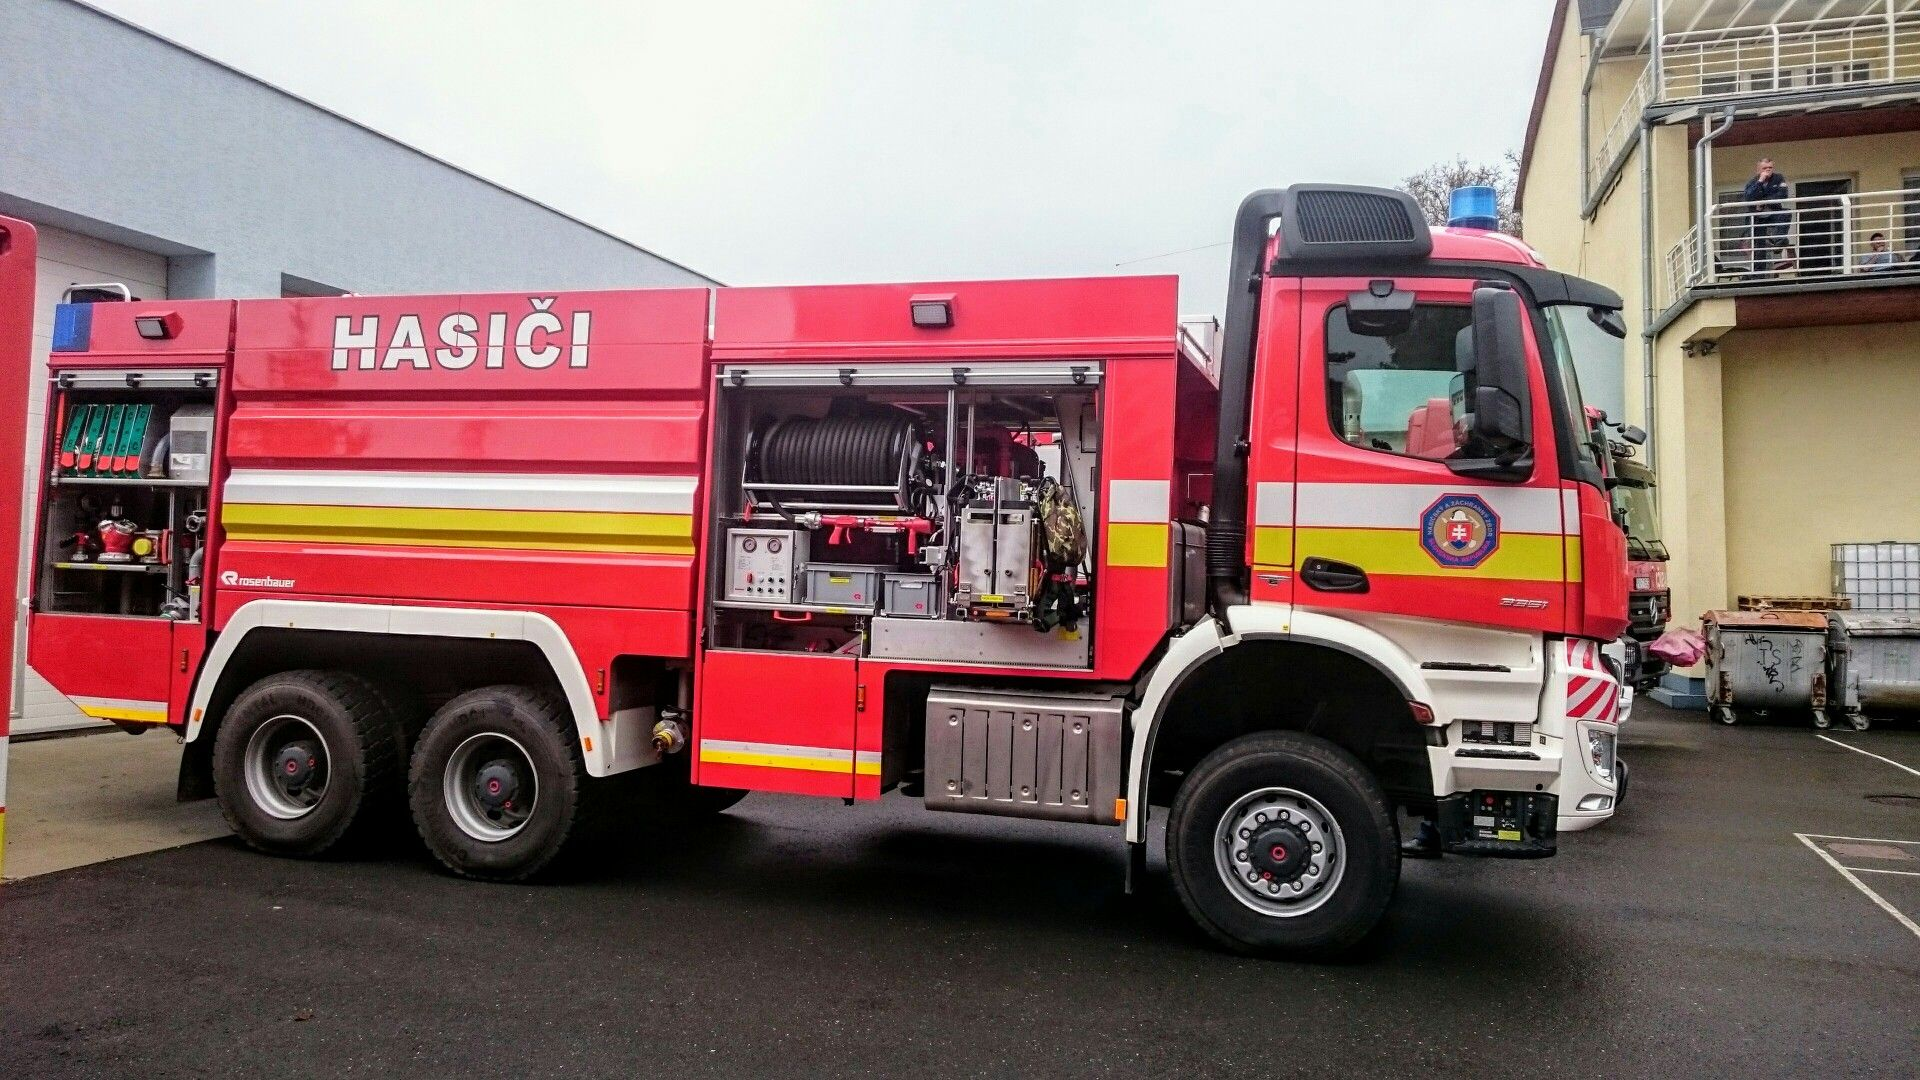 Mercedes Arocs Fire Truck Fire Trucks Trucks Police Cars